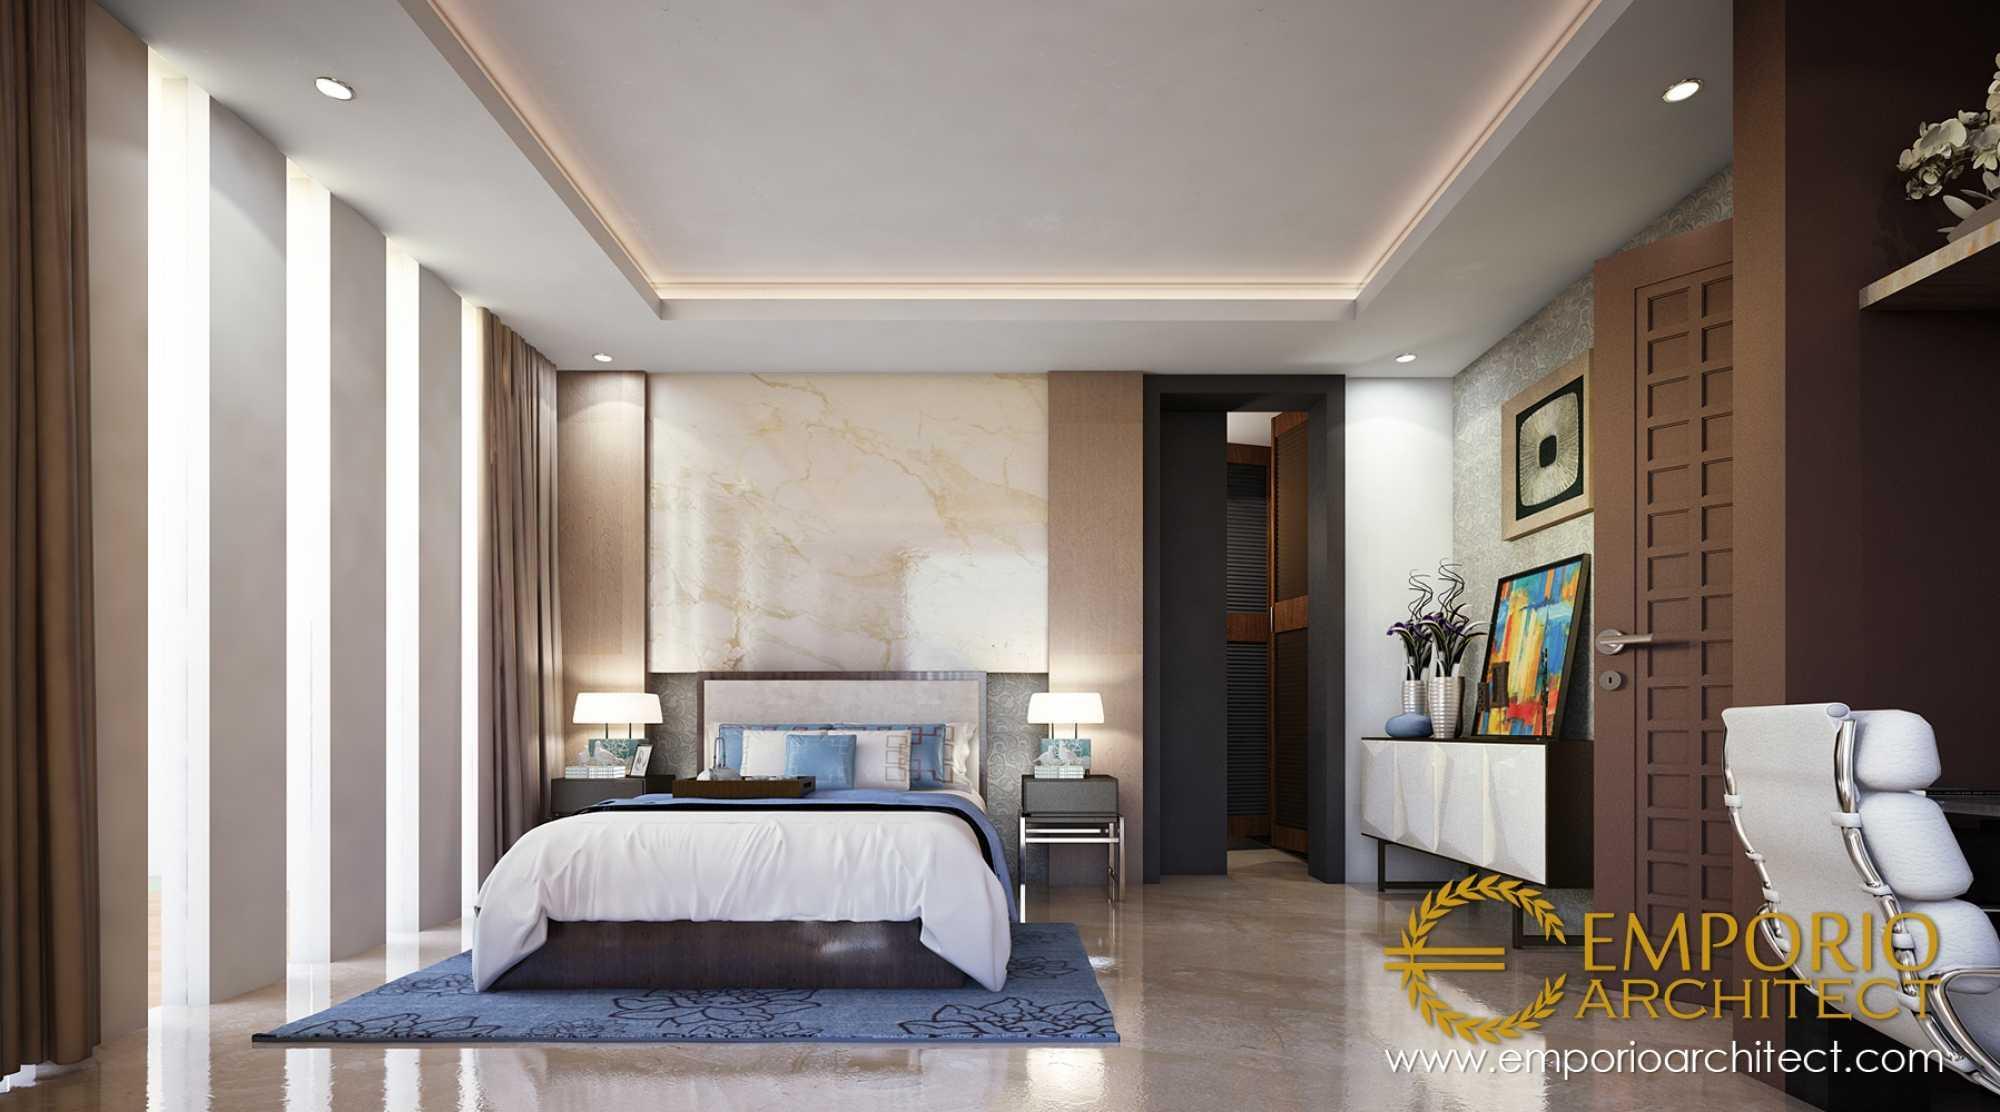 Emporio Architect Desain Rumah Modern Tropis 339  @ Lombok Pulau Lombok, Nusa Tenggara Bar., Indonesia Pulau Lombok, Nusa Tenggara Bar., Indonesia Emporio-Architect-Desain-Rumah-Modern-Tropis-339-Lombok  73346